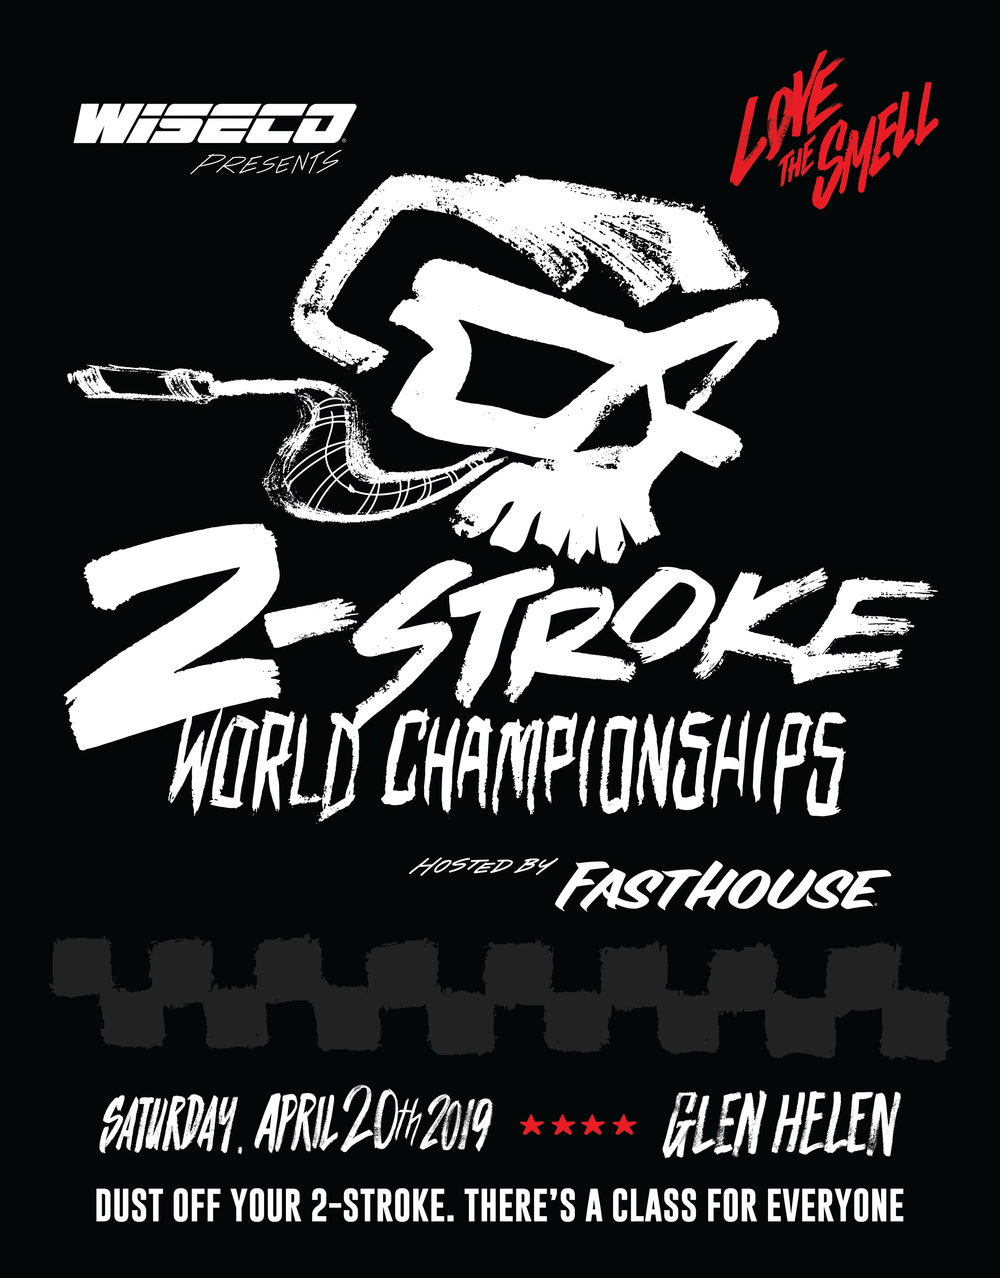 2STROKE_WORLD CHAMPIONSHIP.jpg